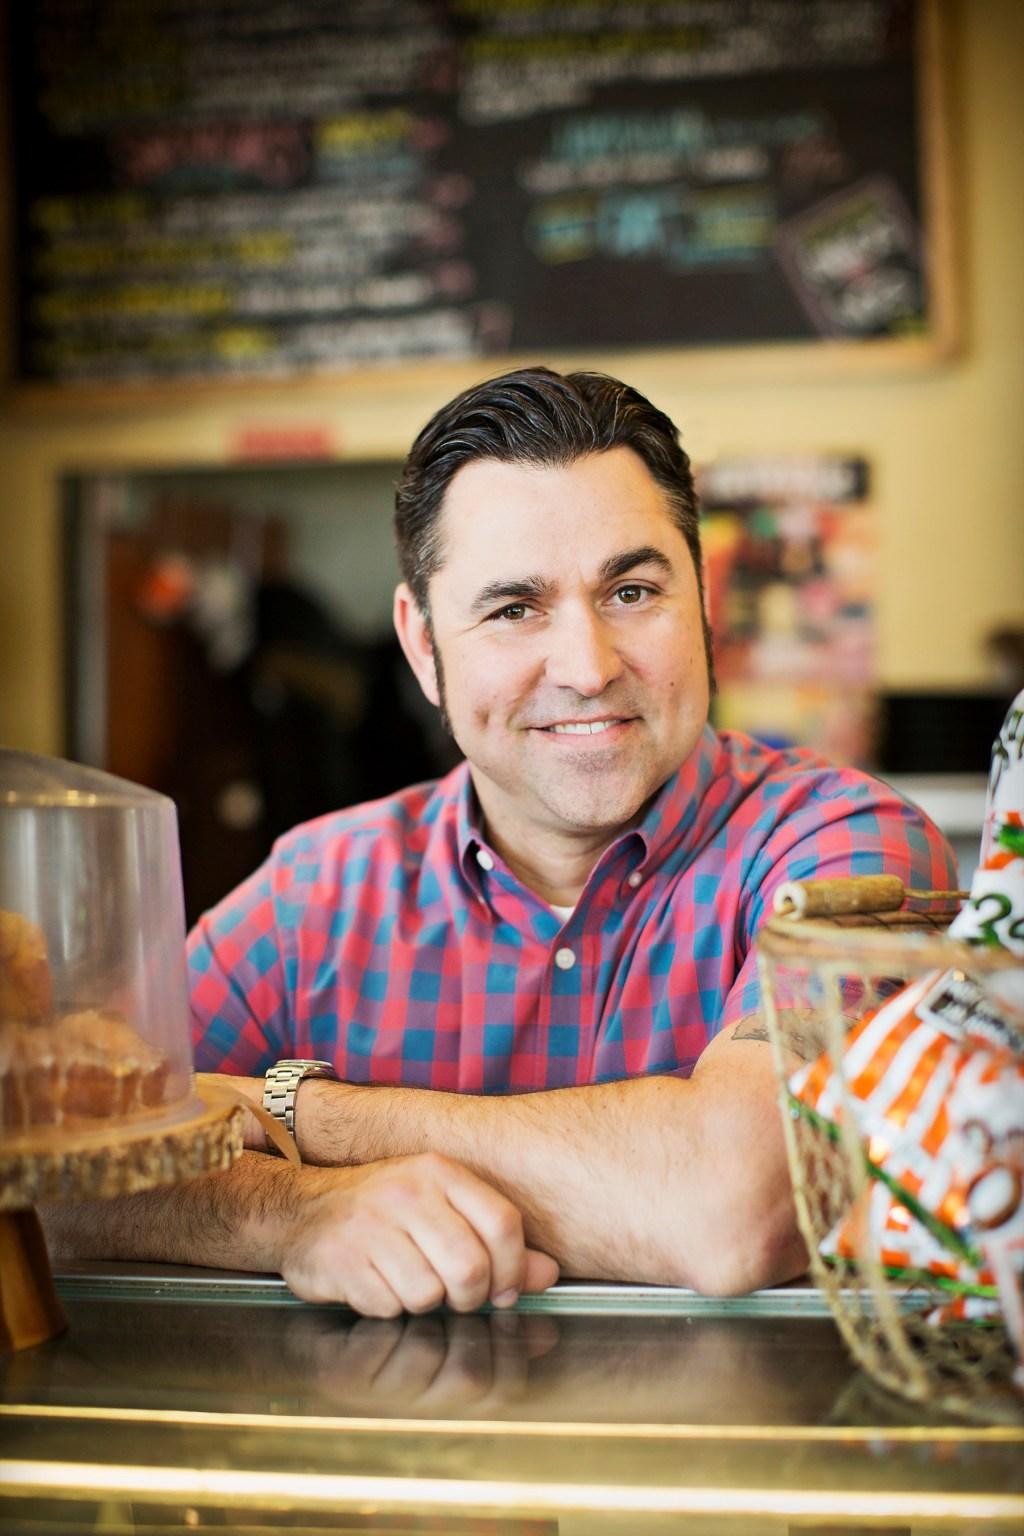 Bayou Bakery founder and Travel Channel host David Gaus. (Courtesy Scott Suchman)